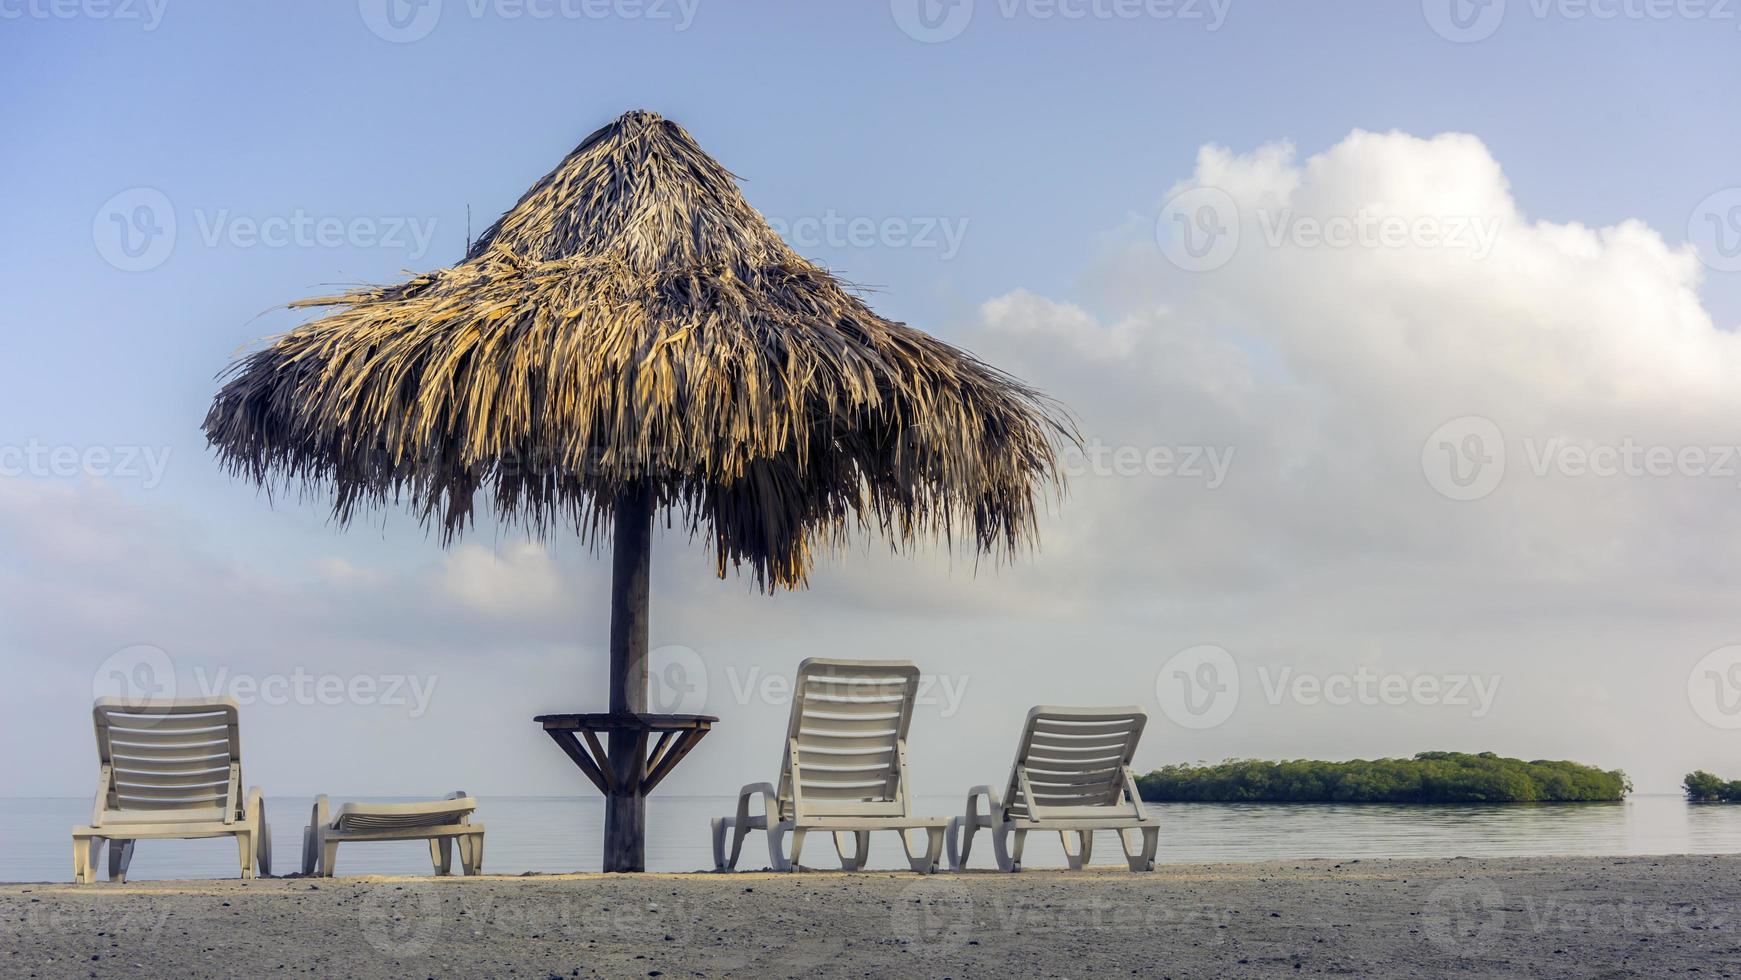 Beach umbrella photo